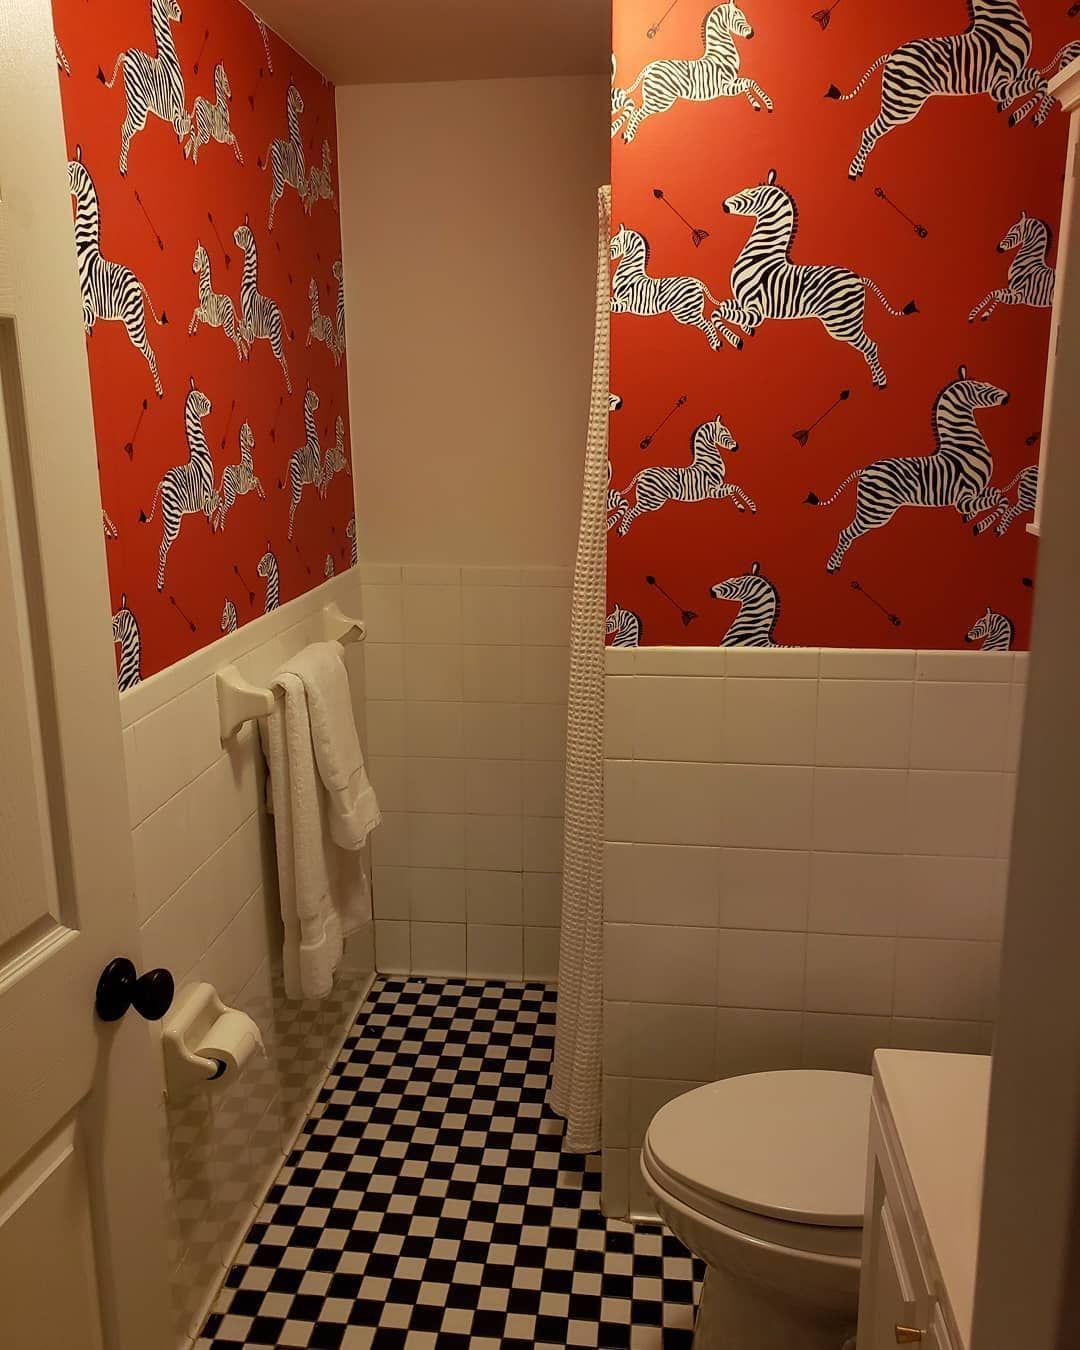 Wildlife Bathroom Decor 2021, Wildlife Bathroom Decor